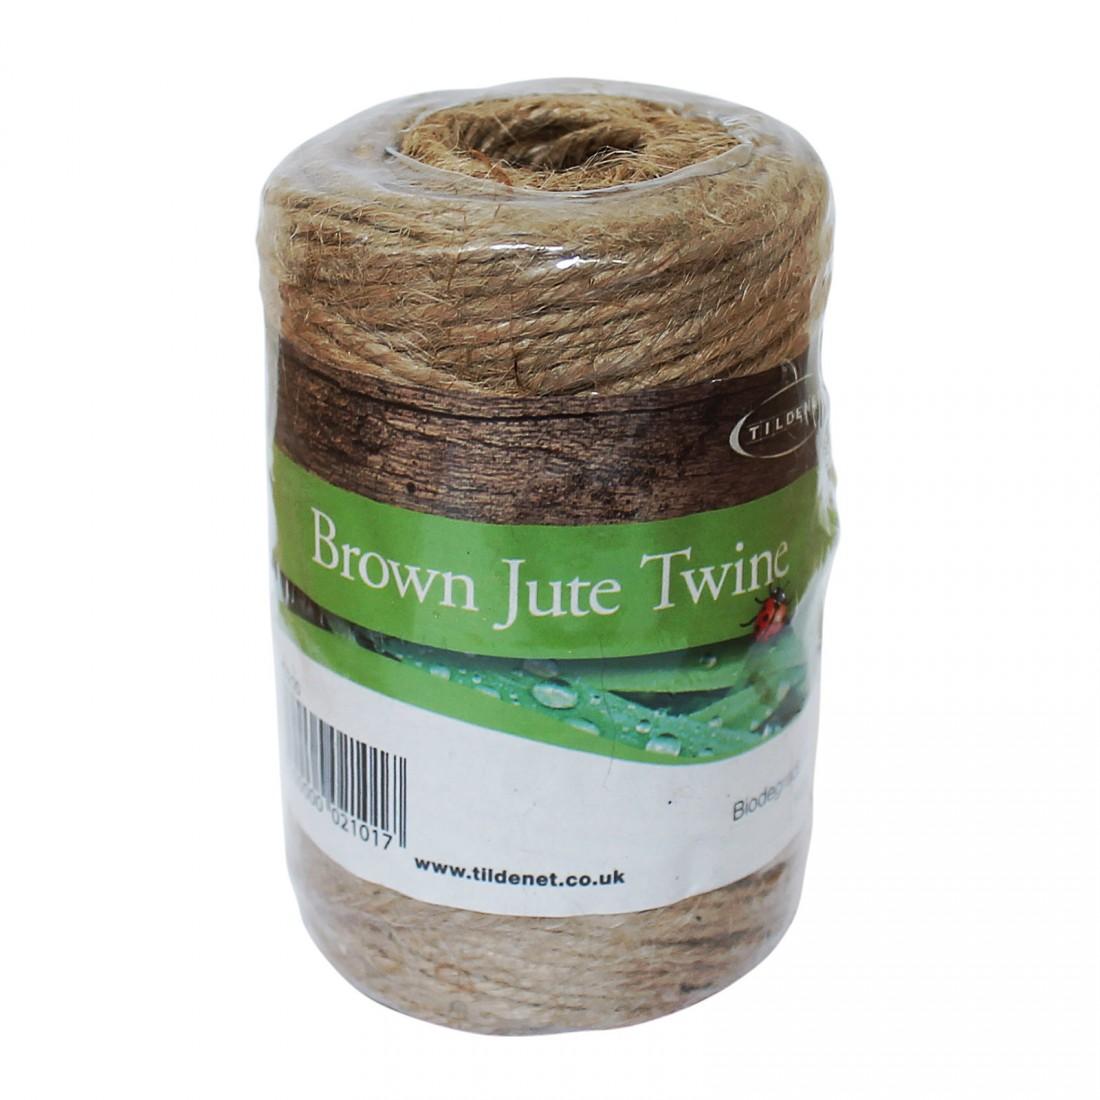 Biodegradable Jute Garden Twine - 100m